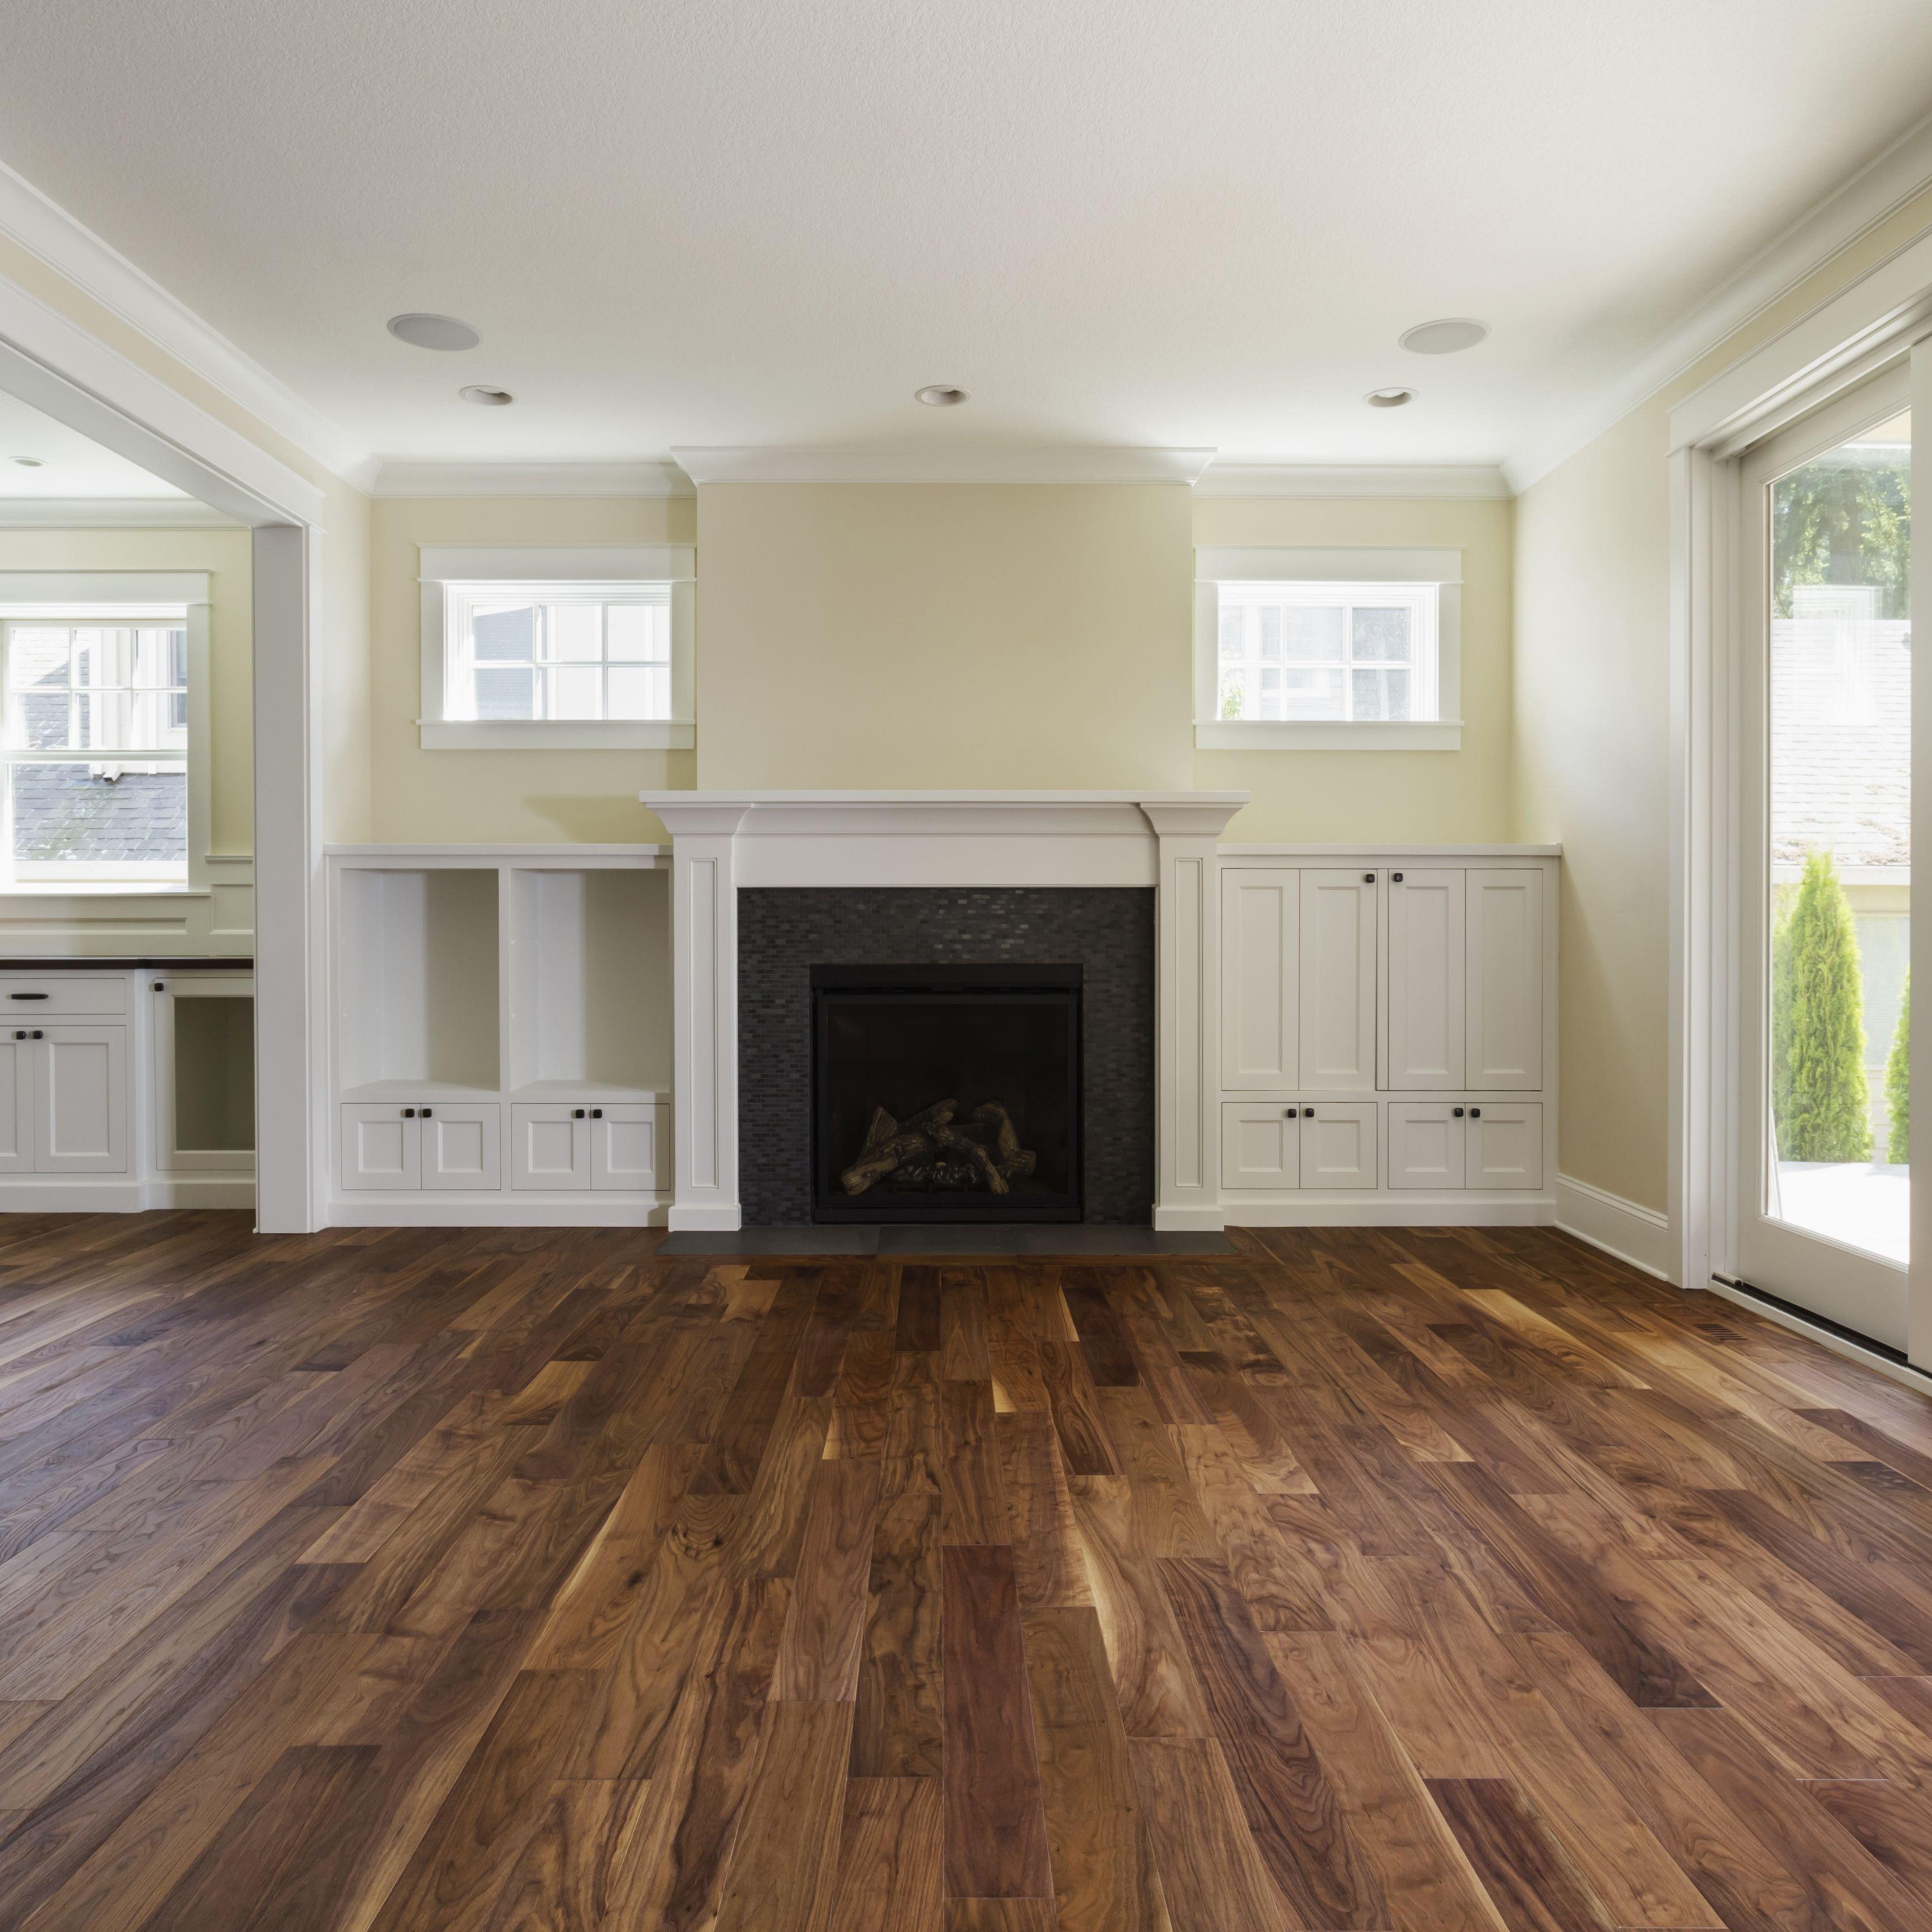 Dark Wood Floor Bedroom Luxury the Pros and Cons Of Prefinished Hardwood Flooring